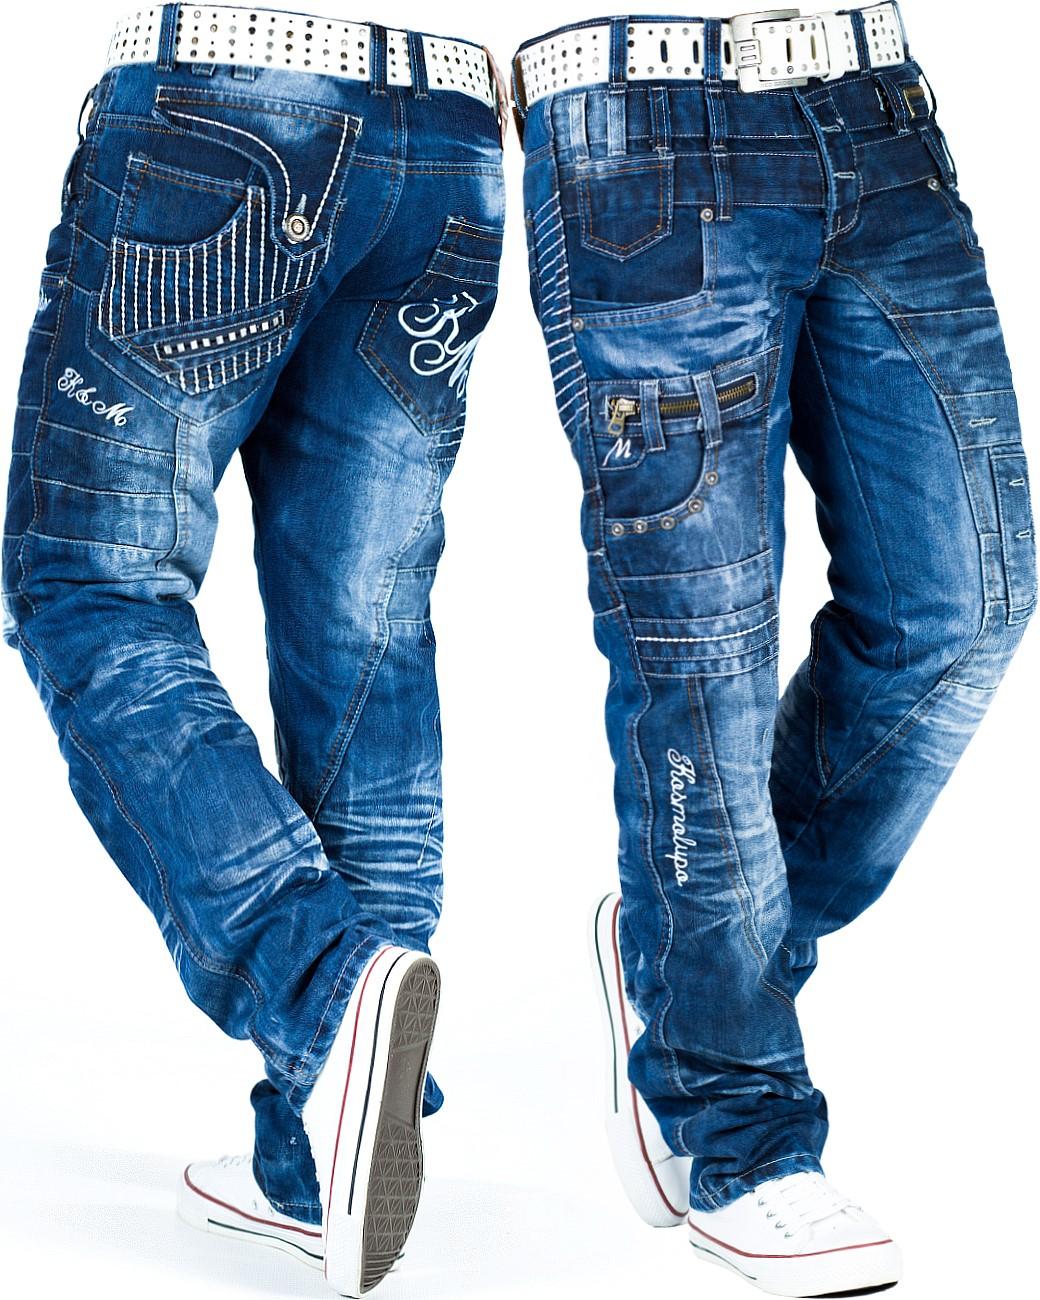 KOSMO Lupo Uomo Jeans Pantaloni streetwear tempo libero Cargo DISCOWEAR DISCOWEAR DISCOWEAR Dope Swag WOW 62d45f